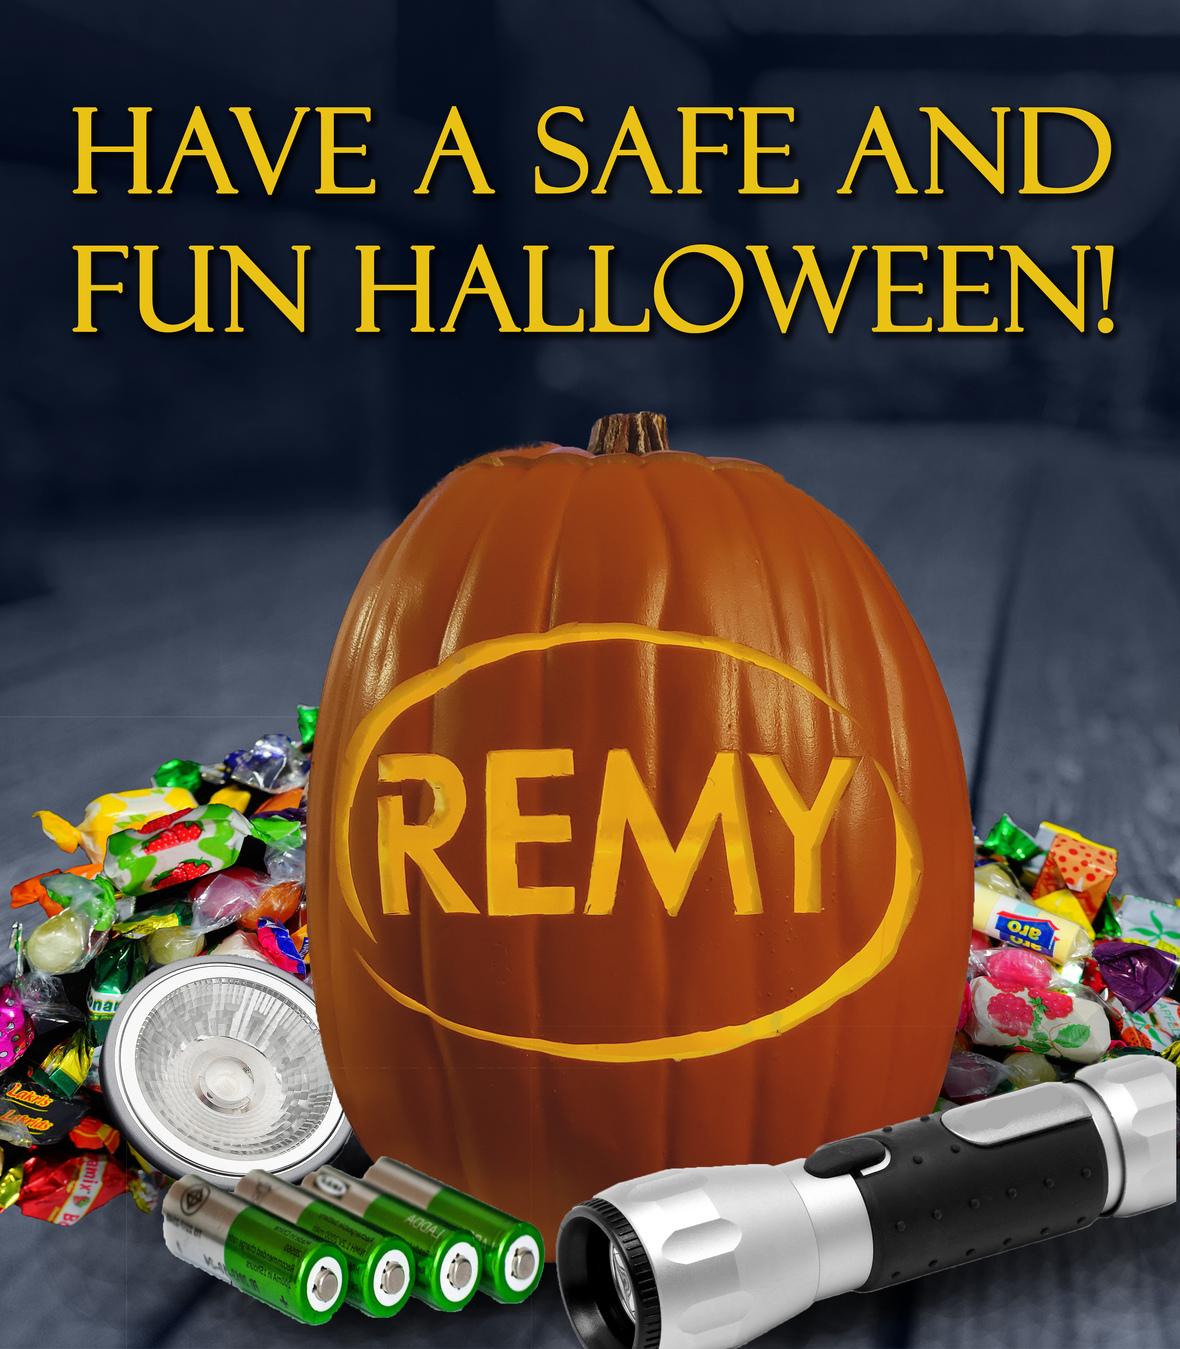 remy-report-halloween-fun